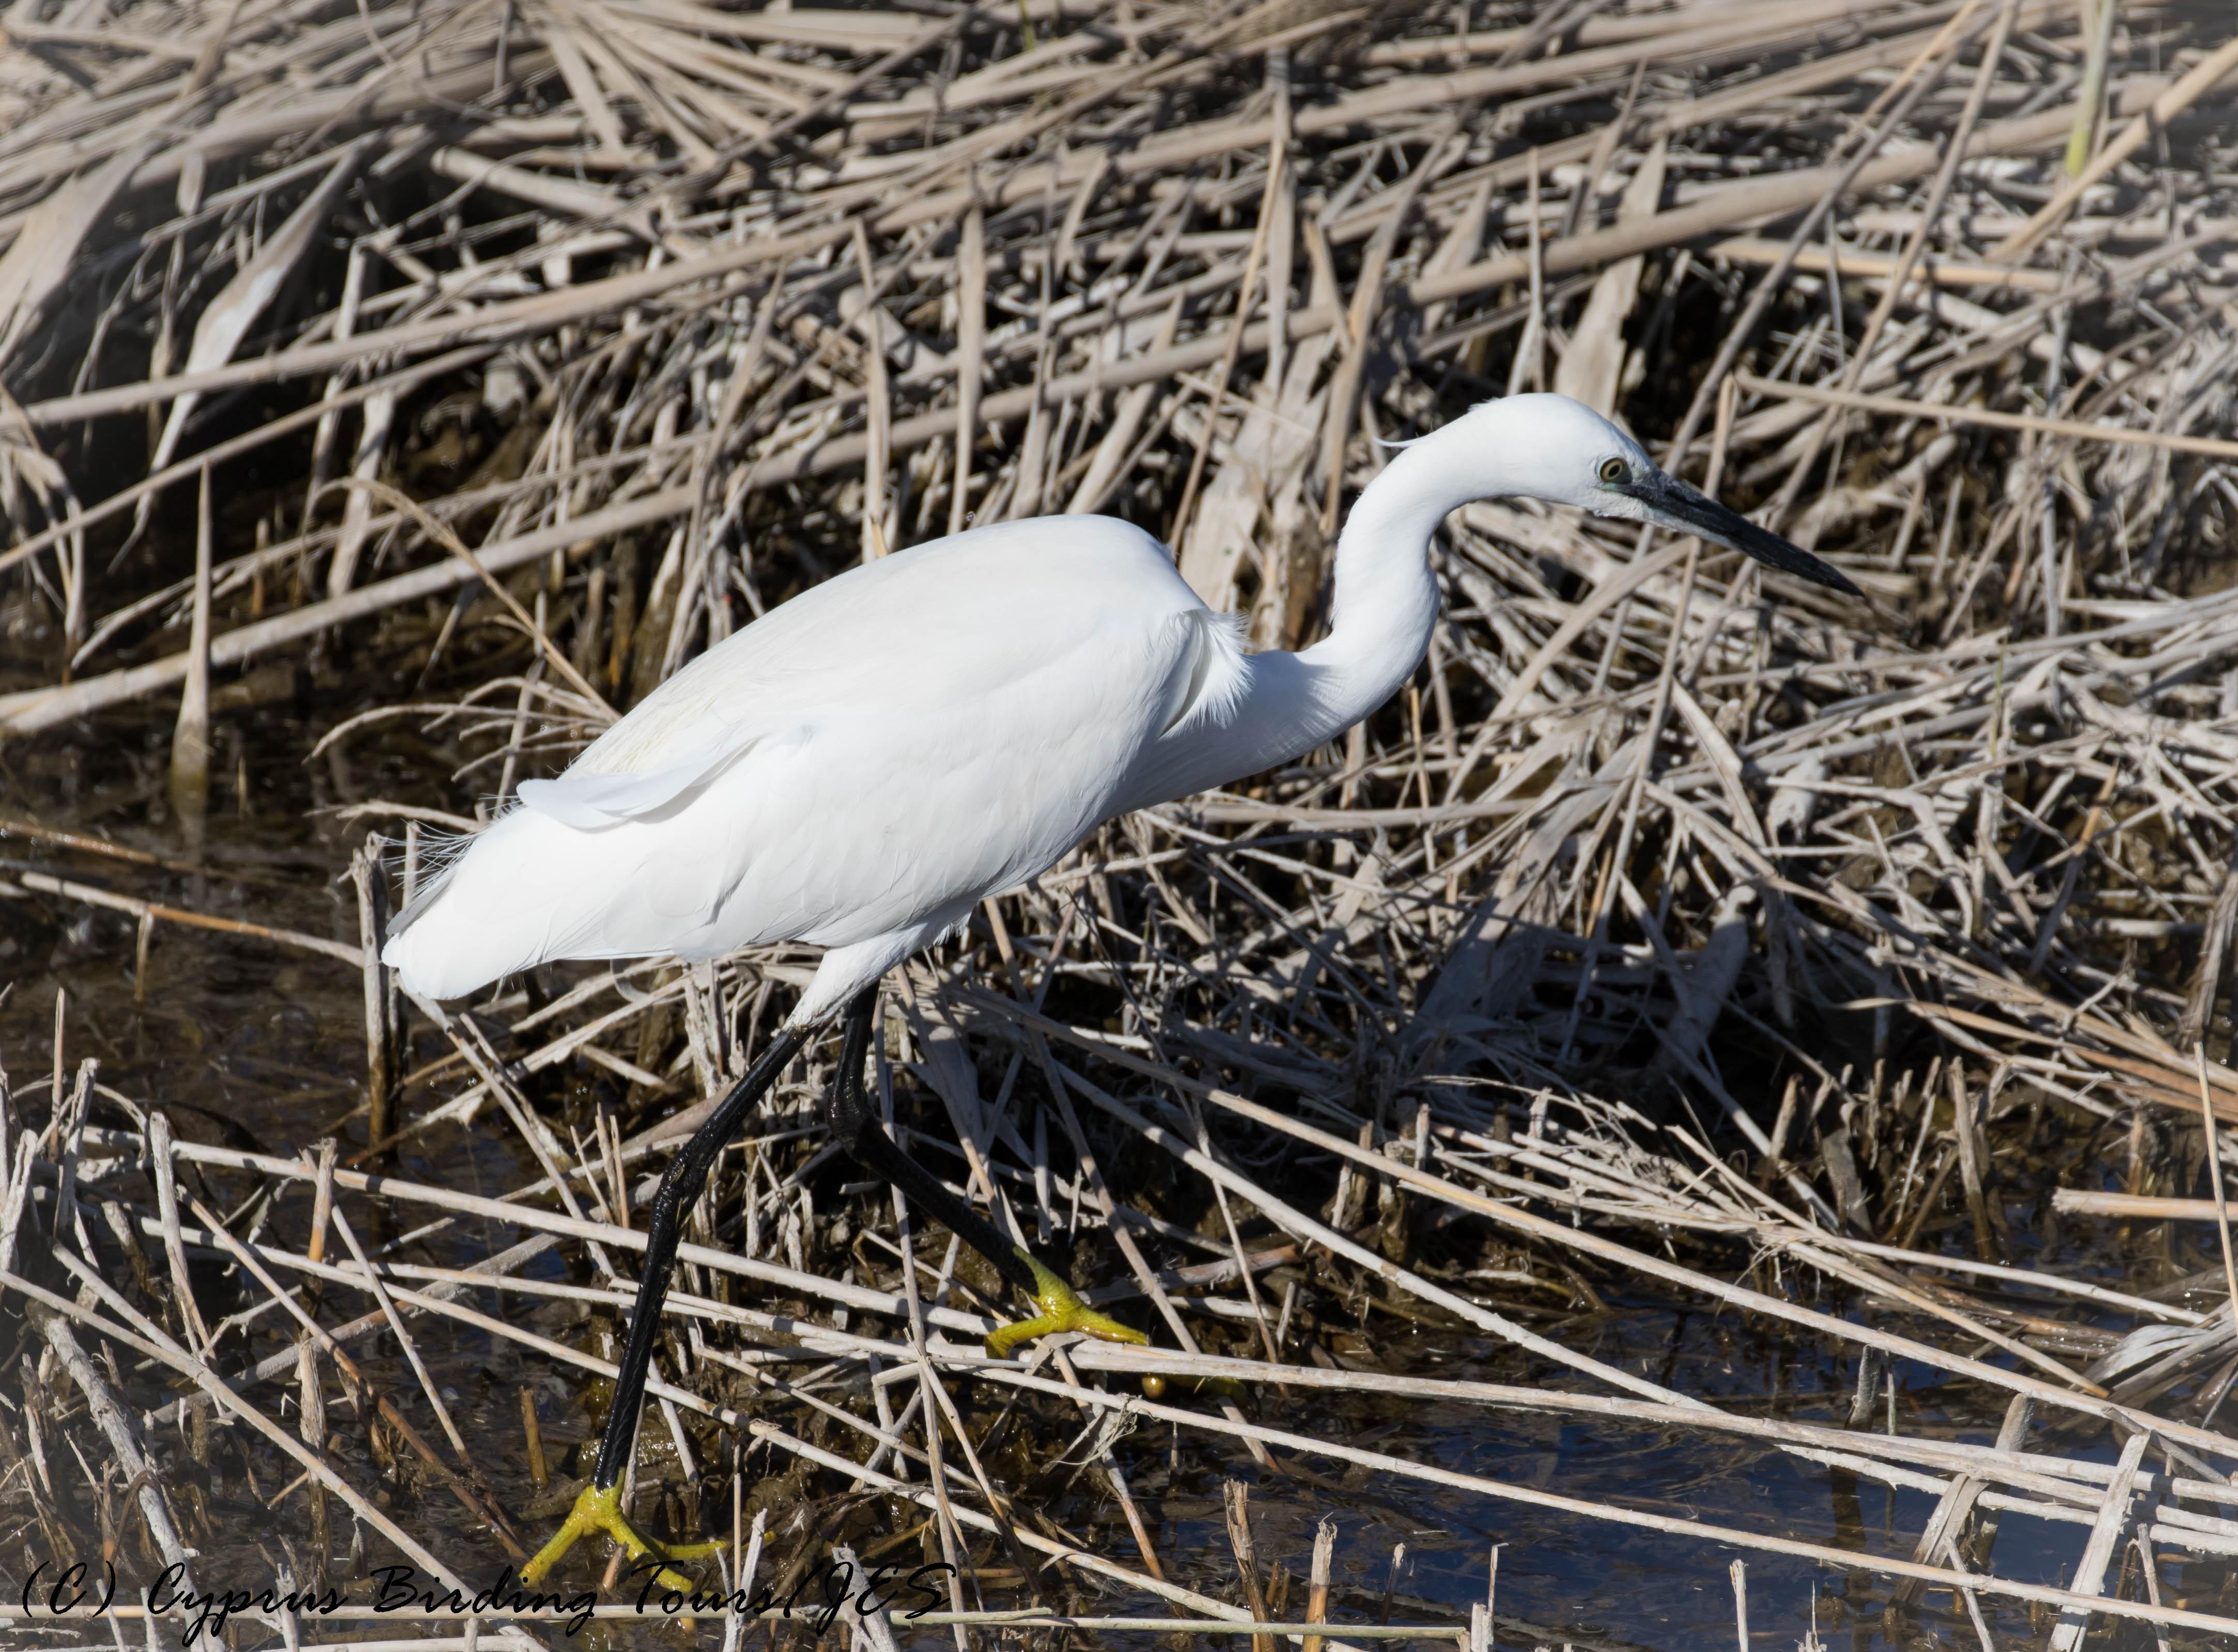 Little Egret, Zakaki Marsh, 25th January 2017 (c) Cyprus Birding Tours